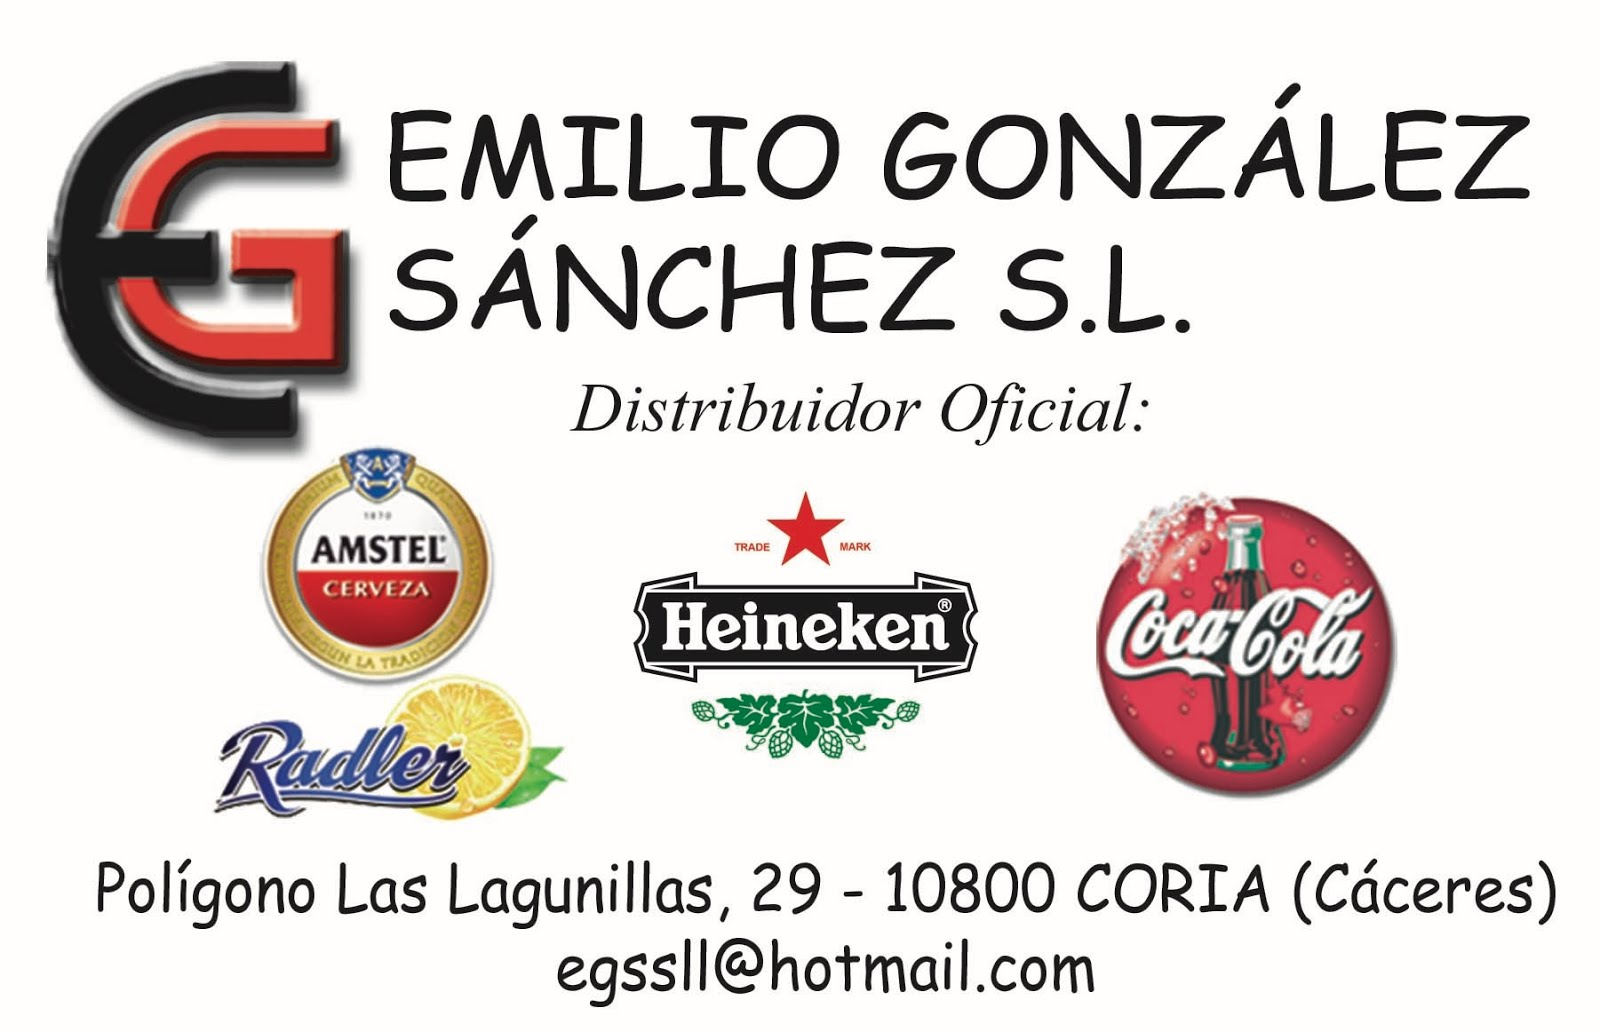 Emilio González Sánchez